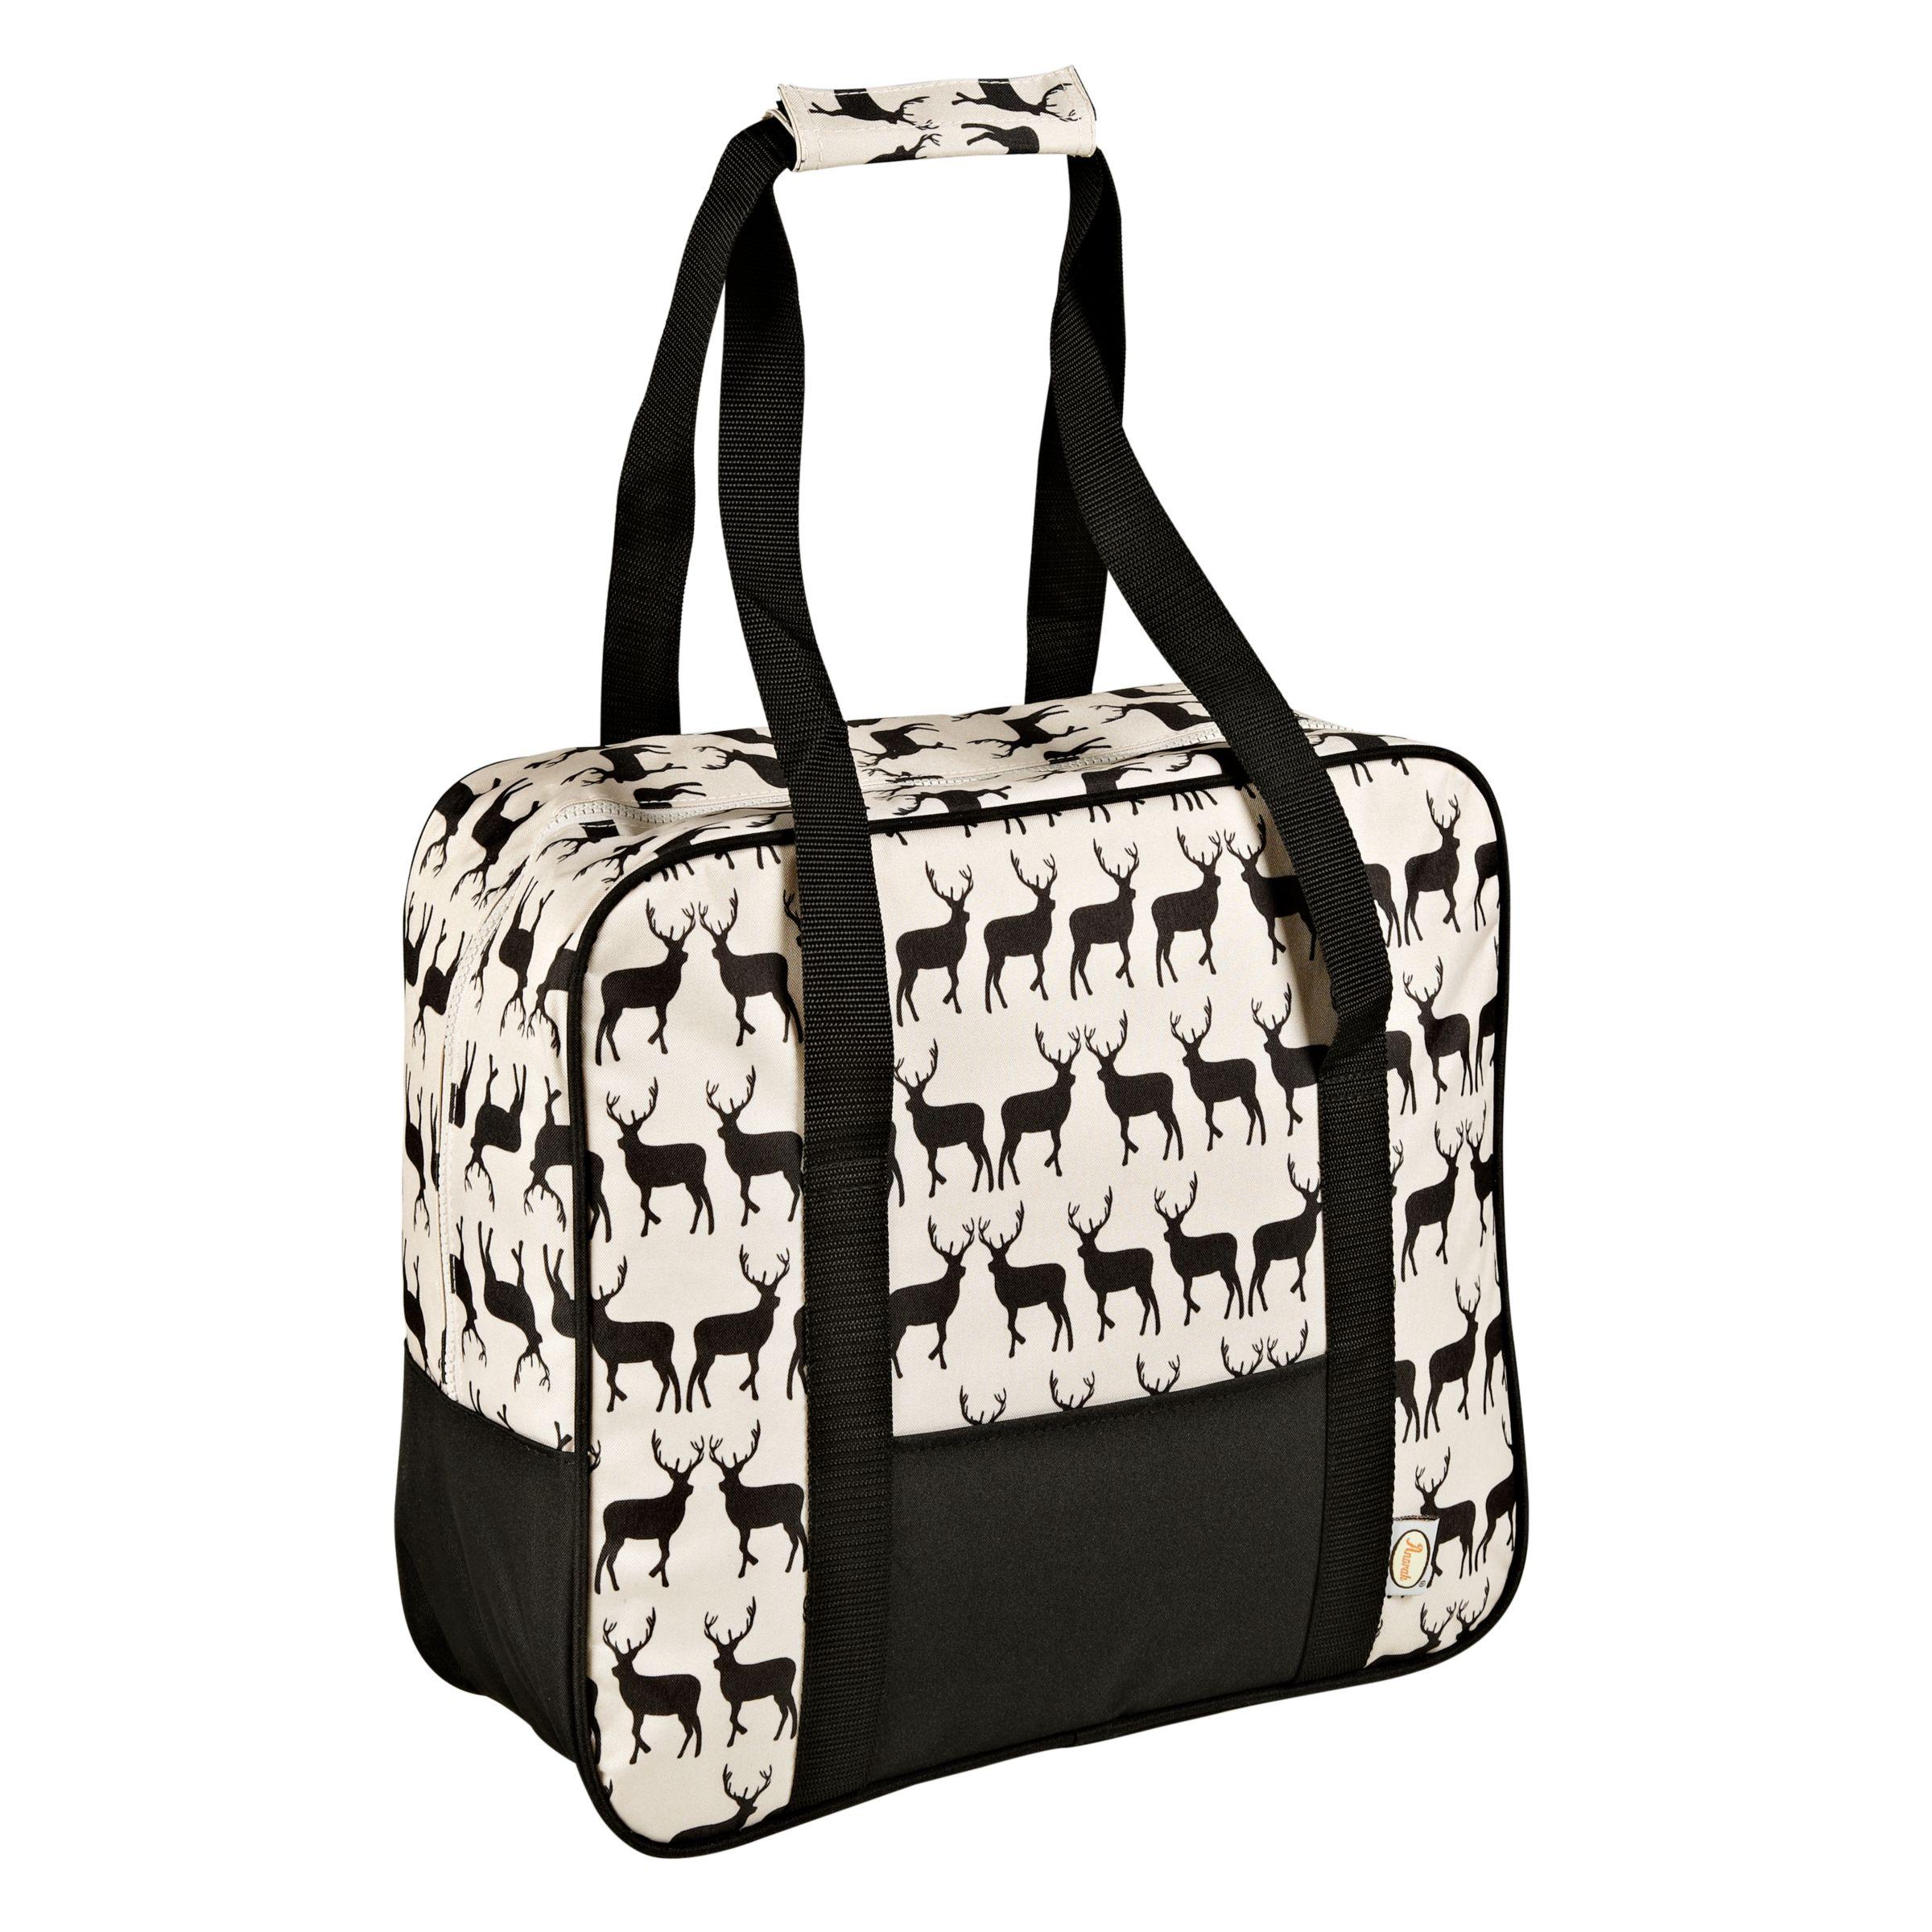 Anorak Kissing Stags Picnic Cool Bag